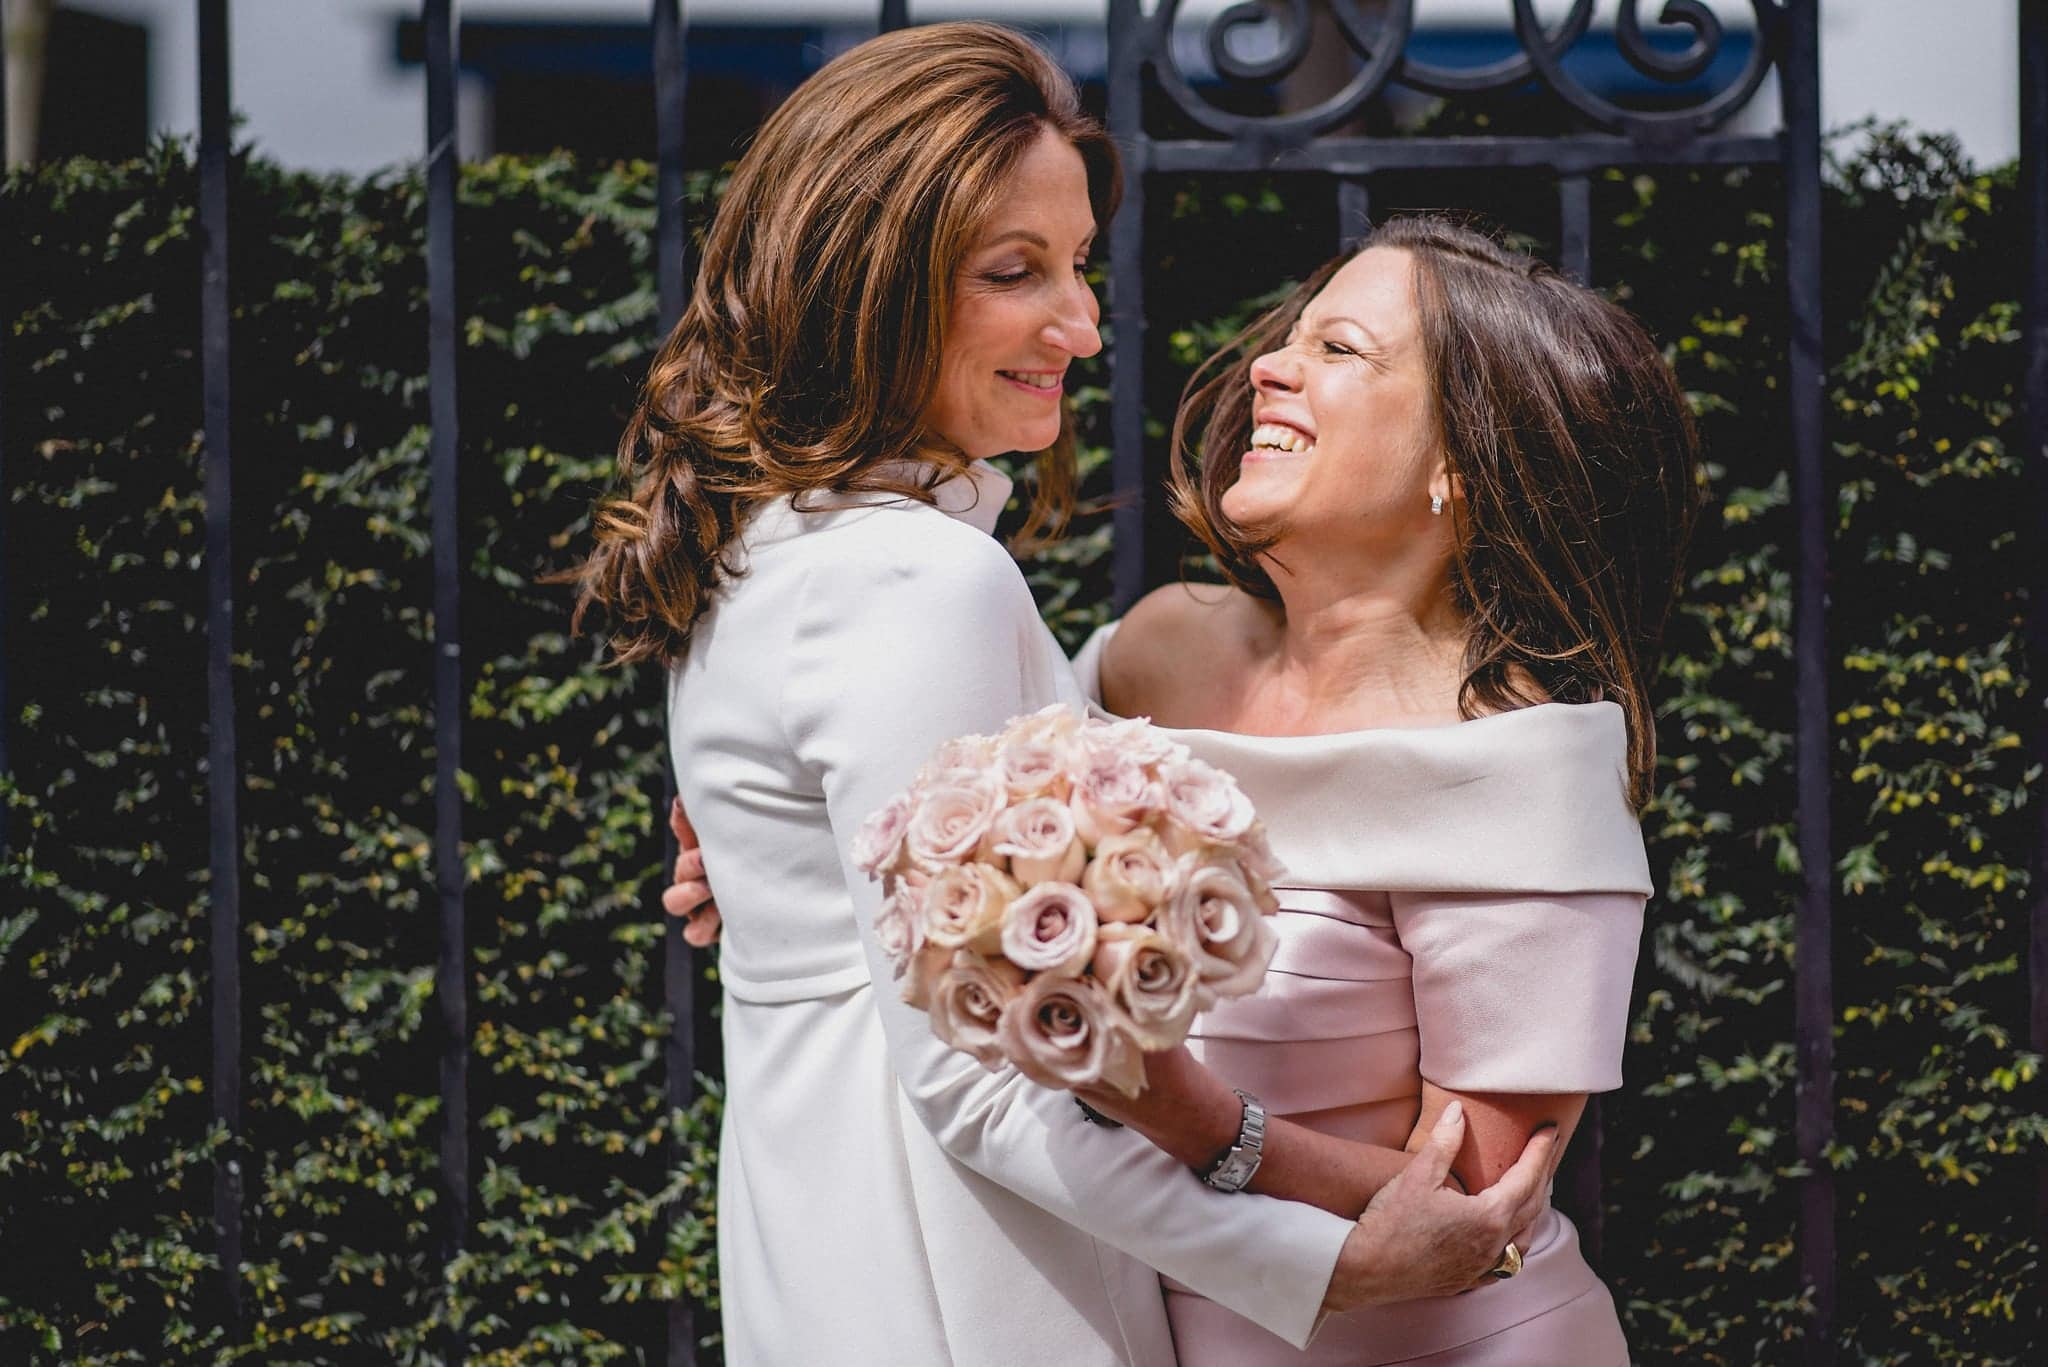 Bride hugs a close friend outside her wedding venue